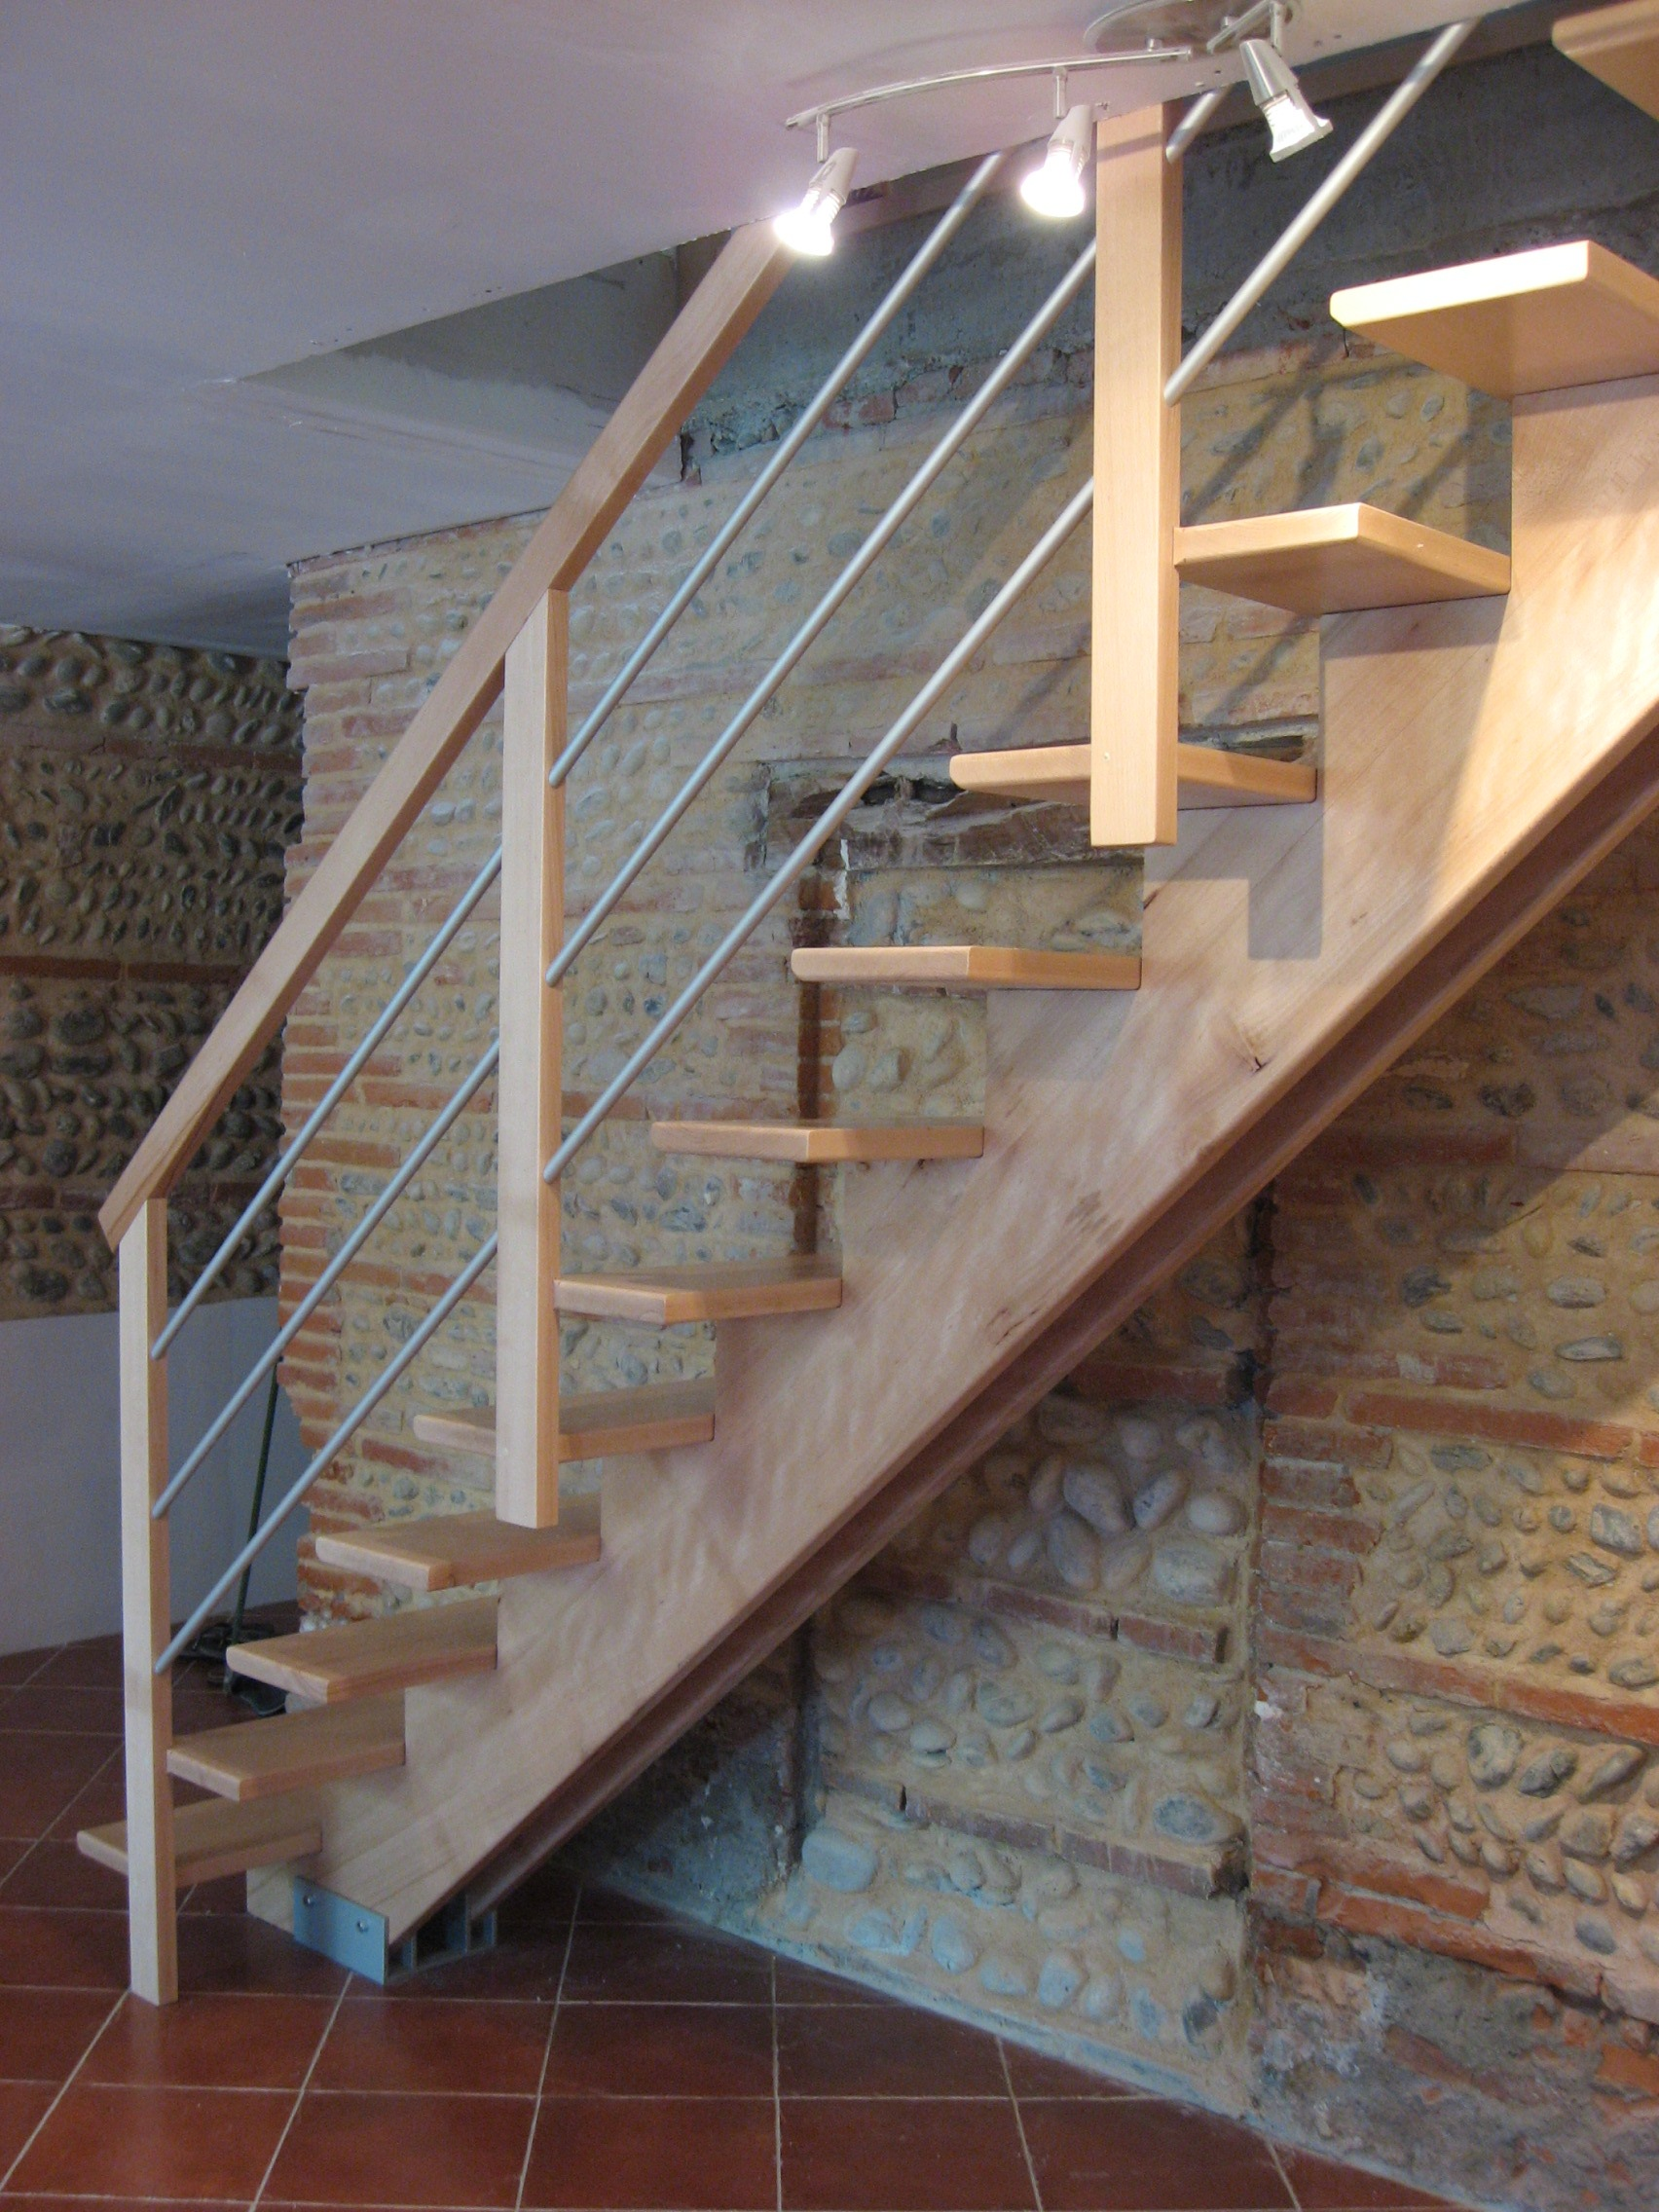 entreprise menuiserie bois toulouse st phane germain. Black Bedroom Furniture Sets. Home Design Ideas